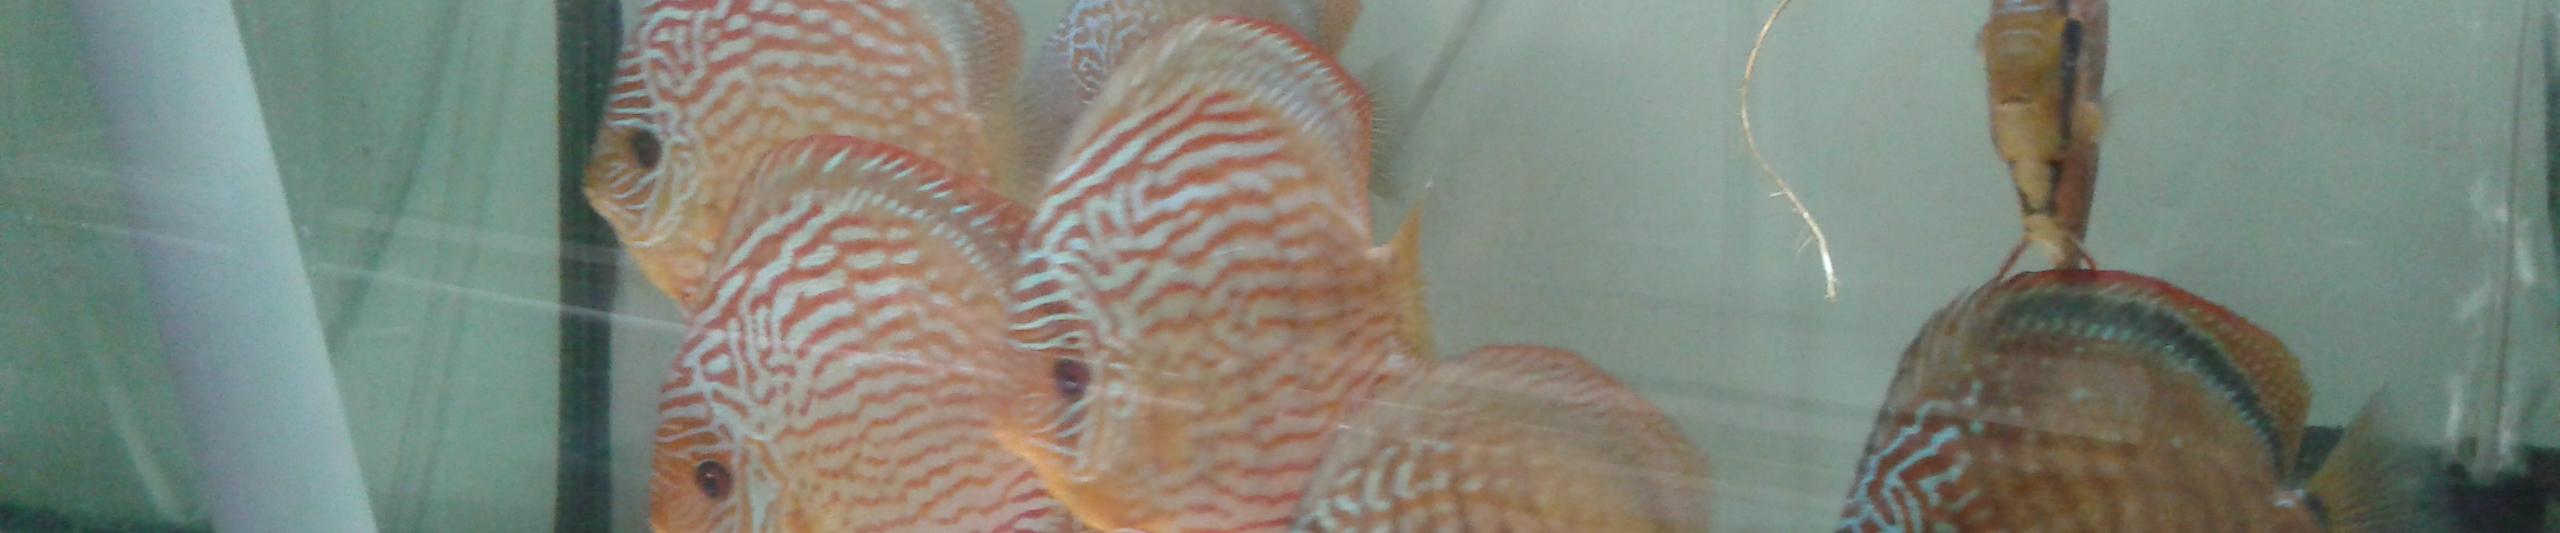 franck-fishroom-discus & co